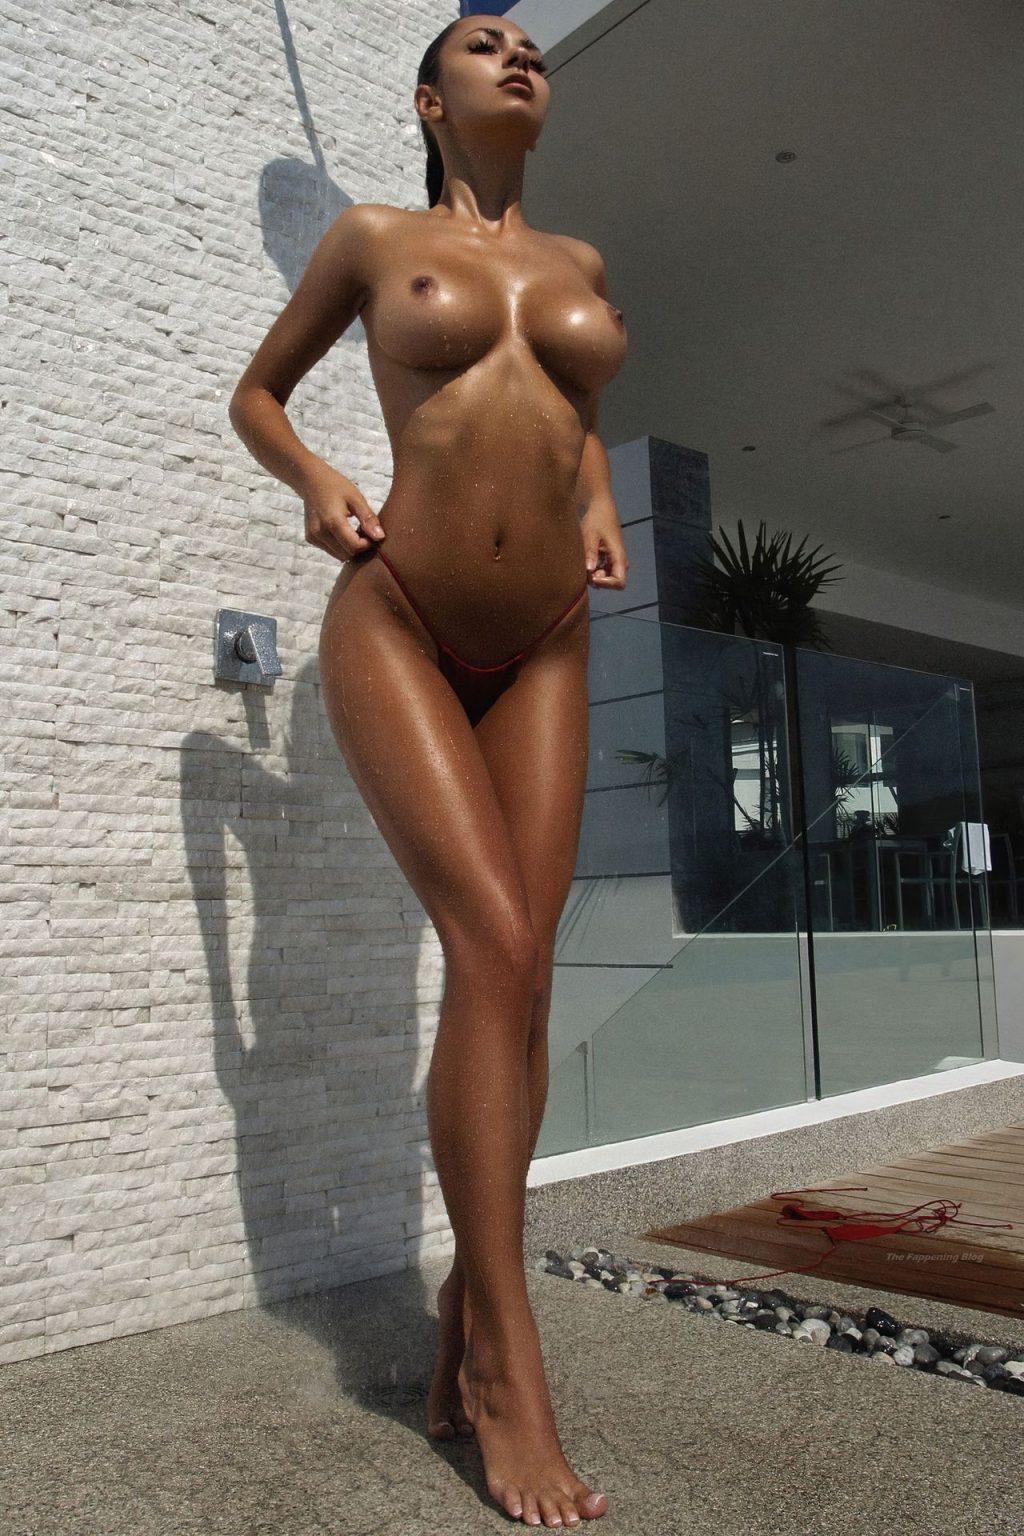 Helga lovekaty nudes